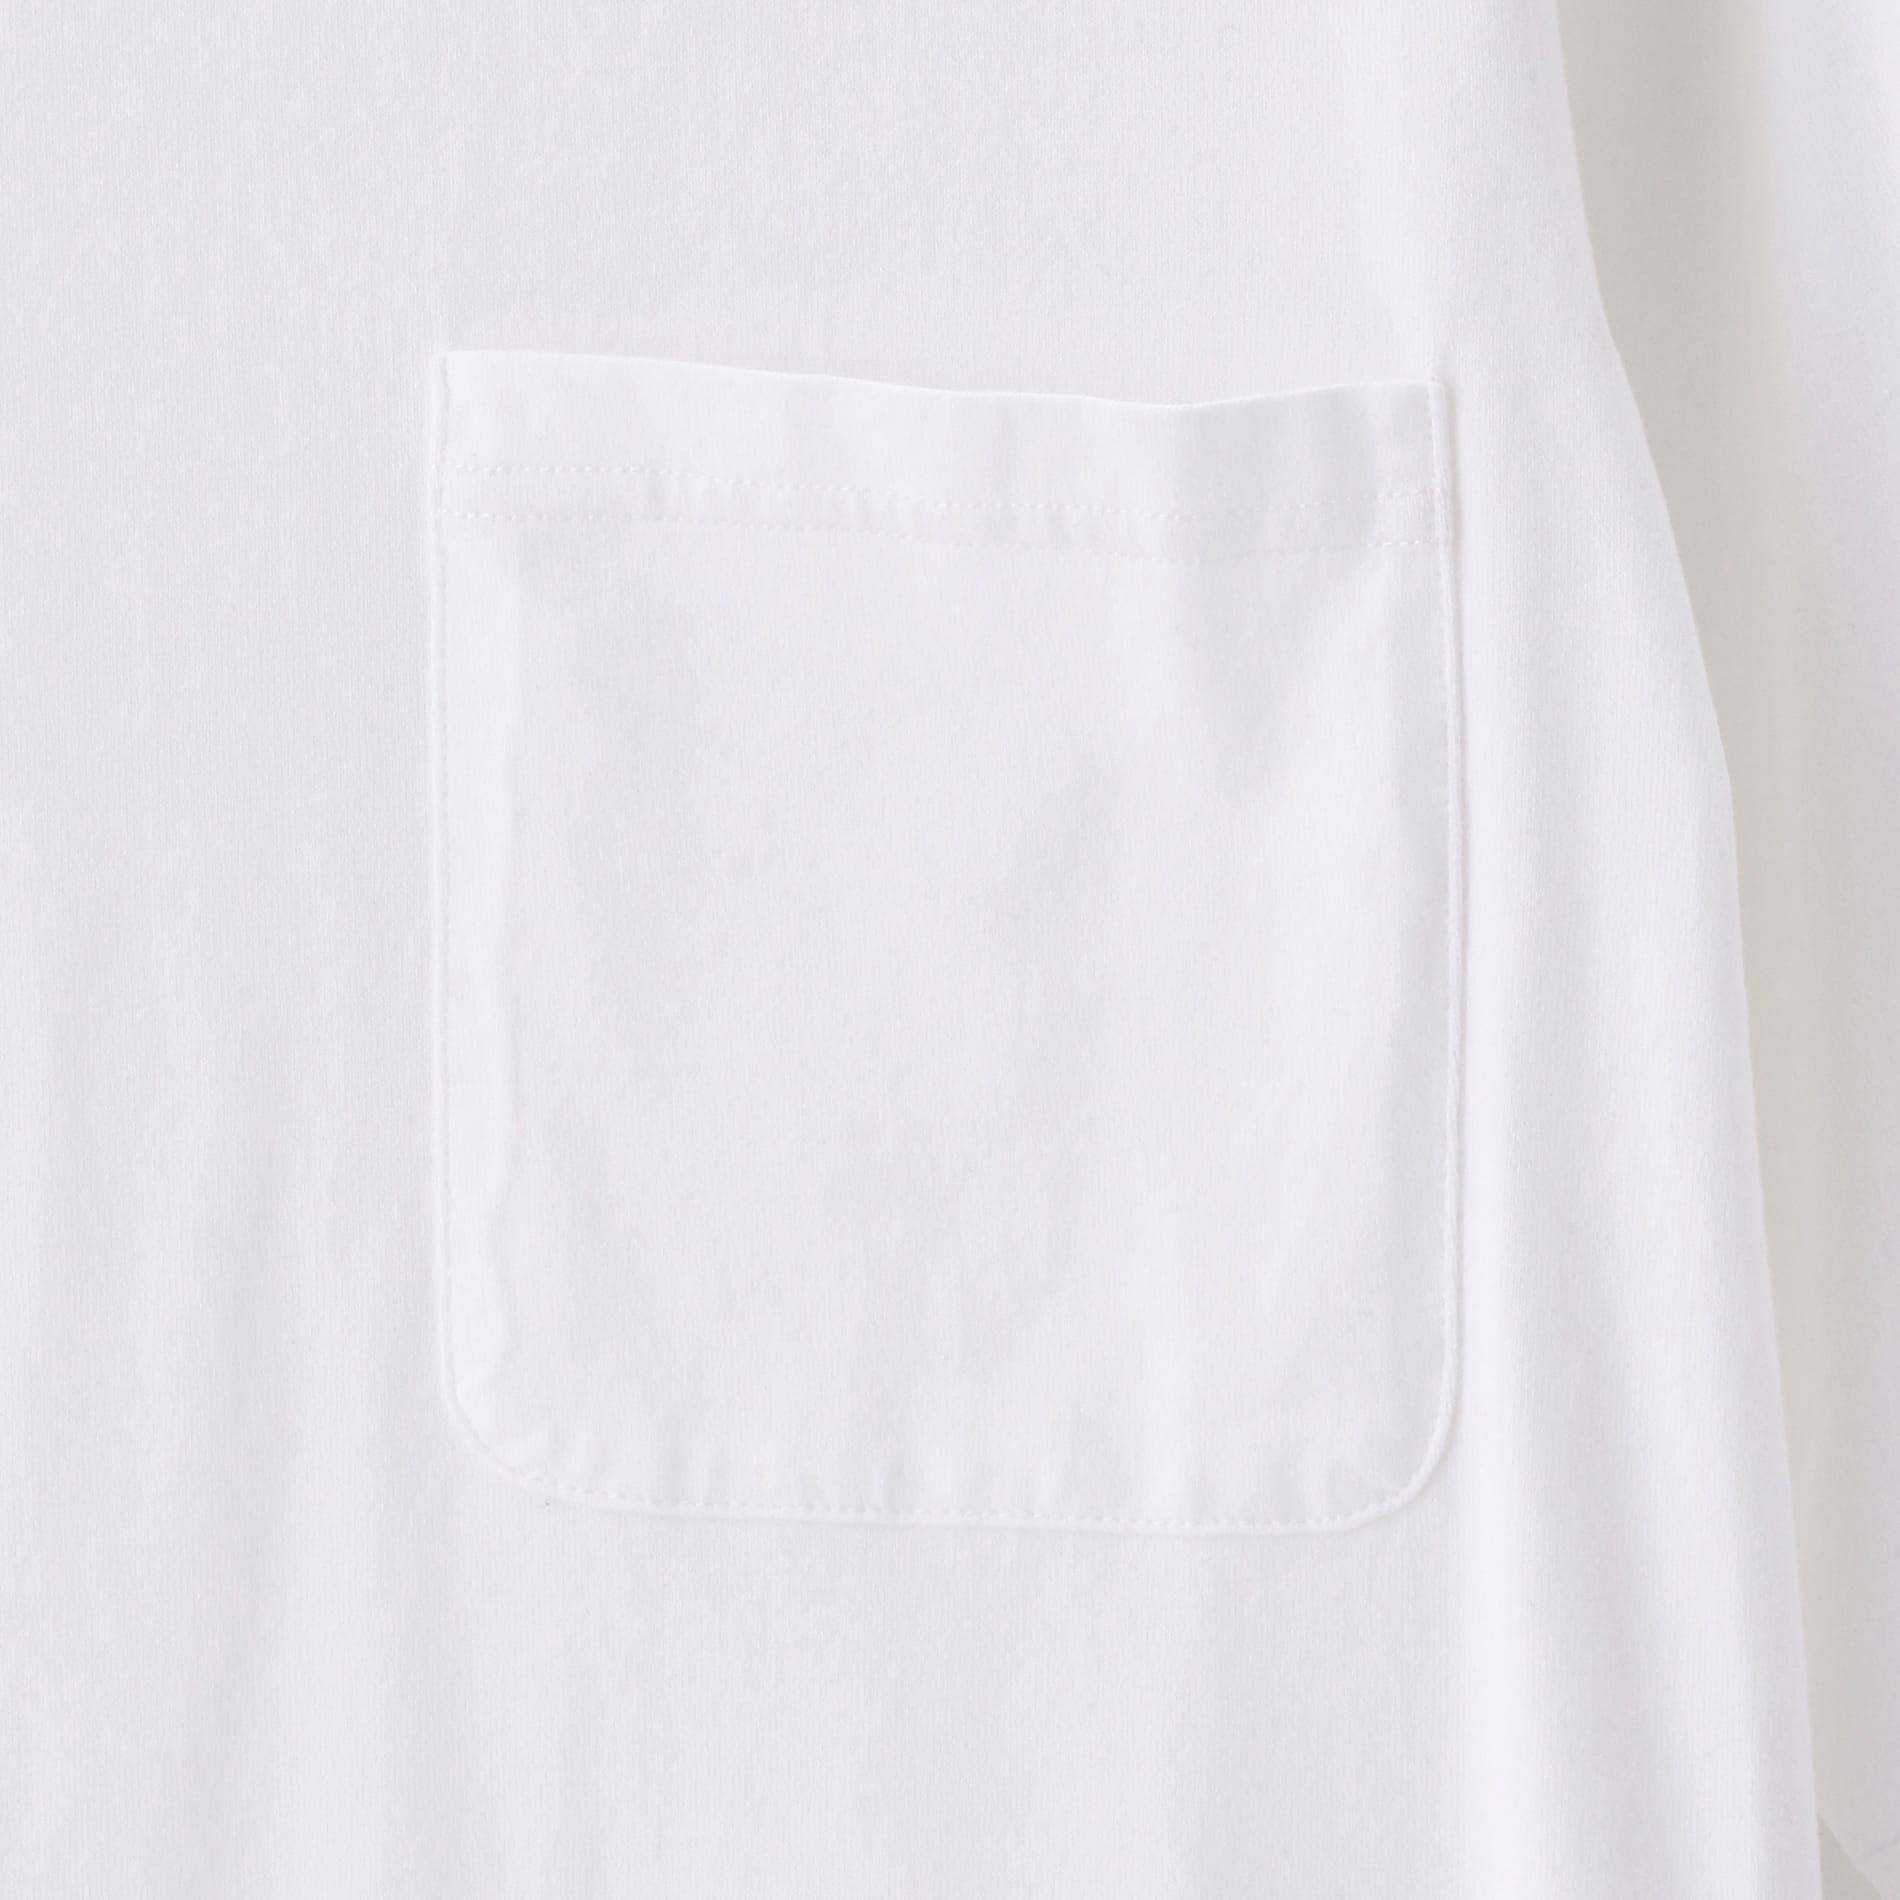 【FACTOTUM】MEN Under Pocket S/S T-shirts 1080139